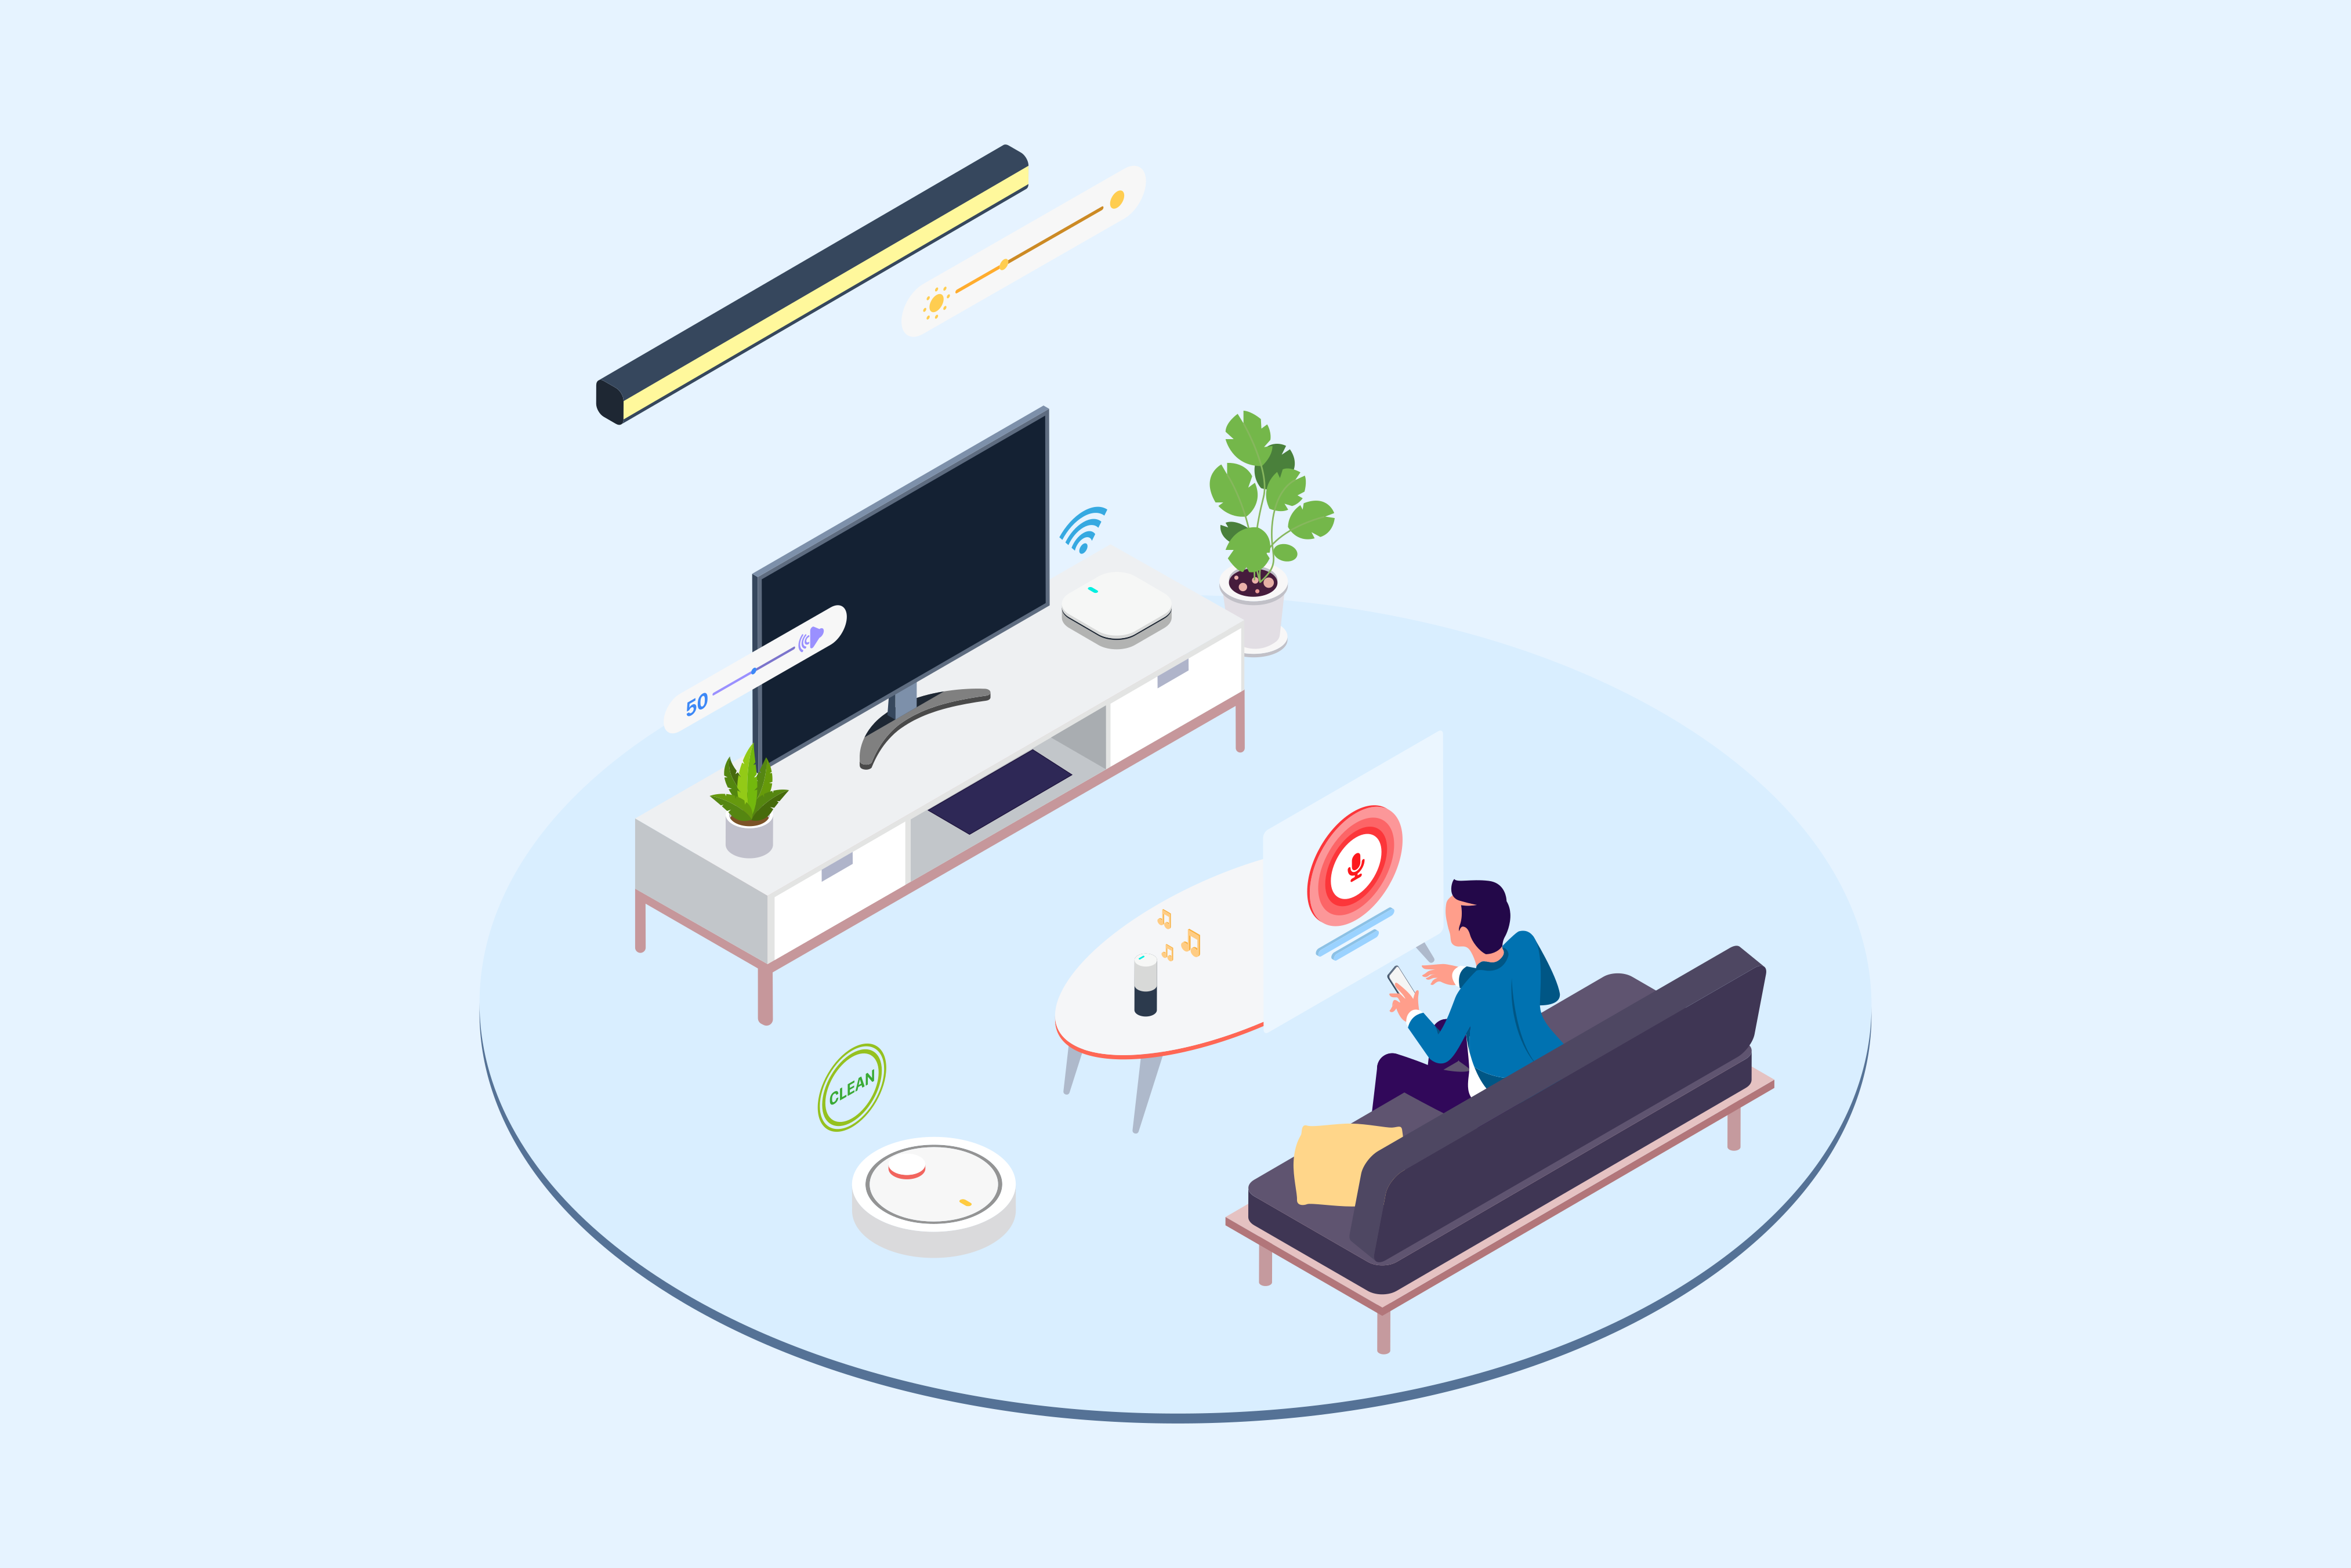 Amazon Voice Enabled Home Illustration